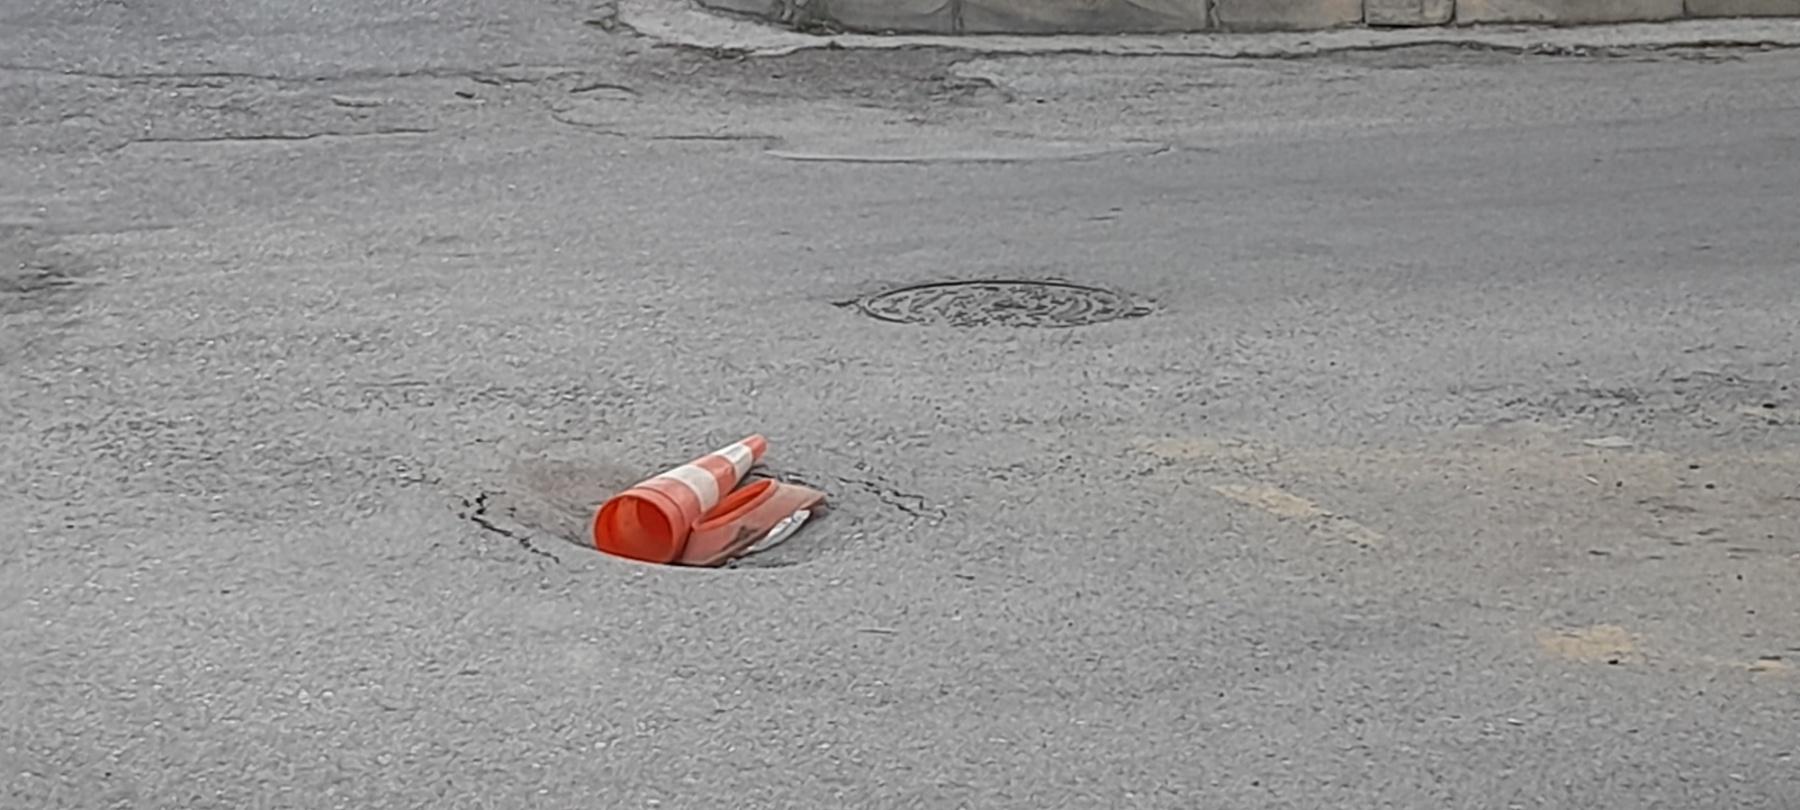 "kozan.gr: Kοζάνη: Άλλη μια τρύπα στο οδόστρωμα, επί της οδού Ασκίου, καλυμμένη με ""πατέντα"" από κώνους (Φωτογραφίες)"